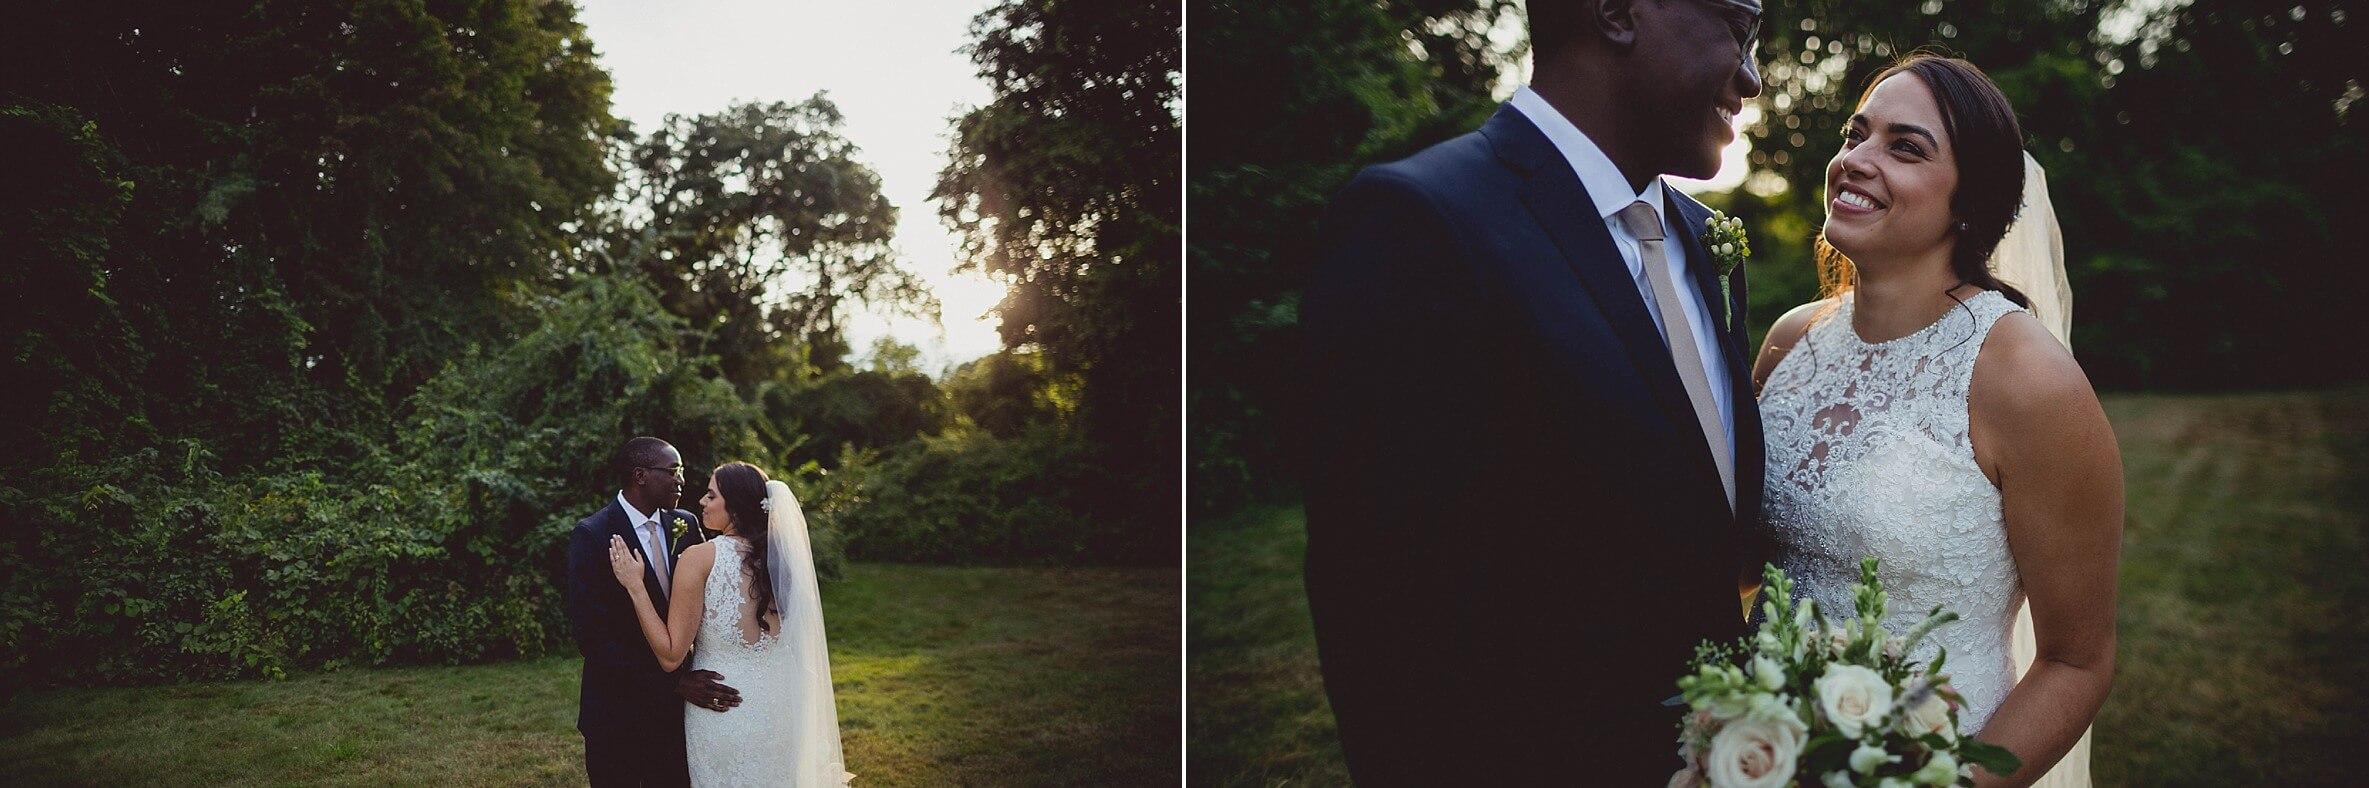 Hellenic Center Wedding-76.jpg